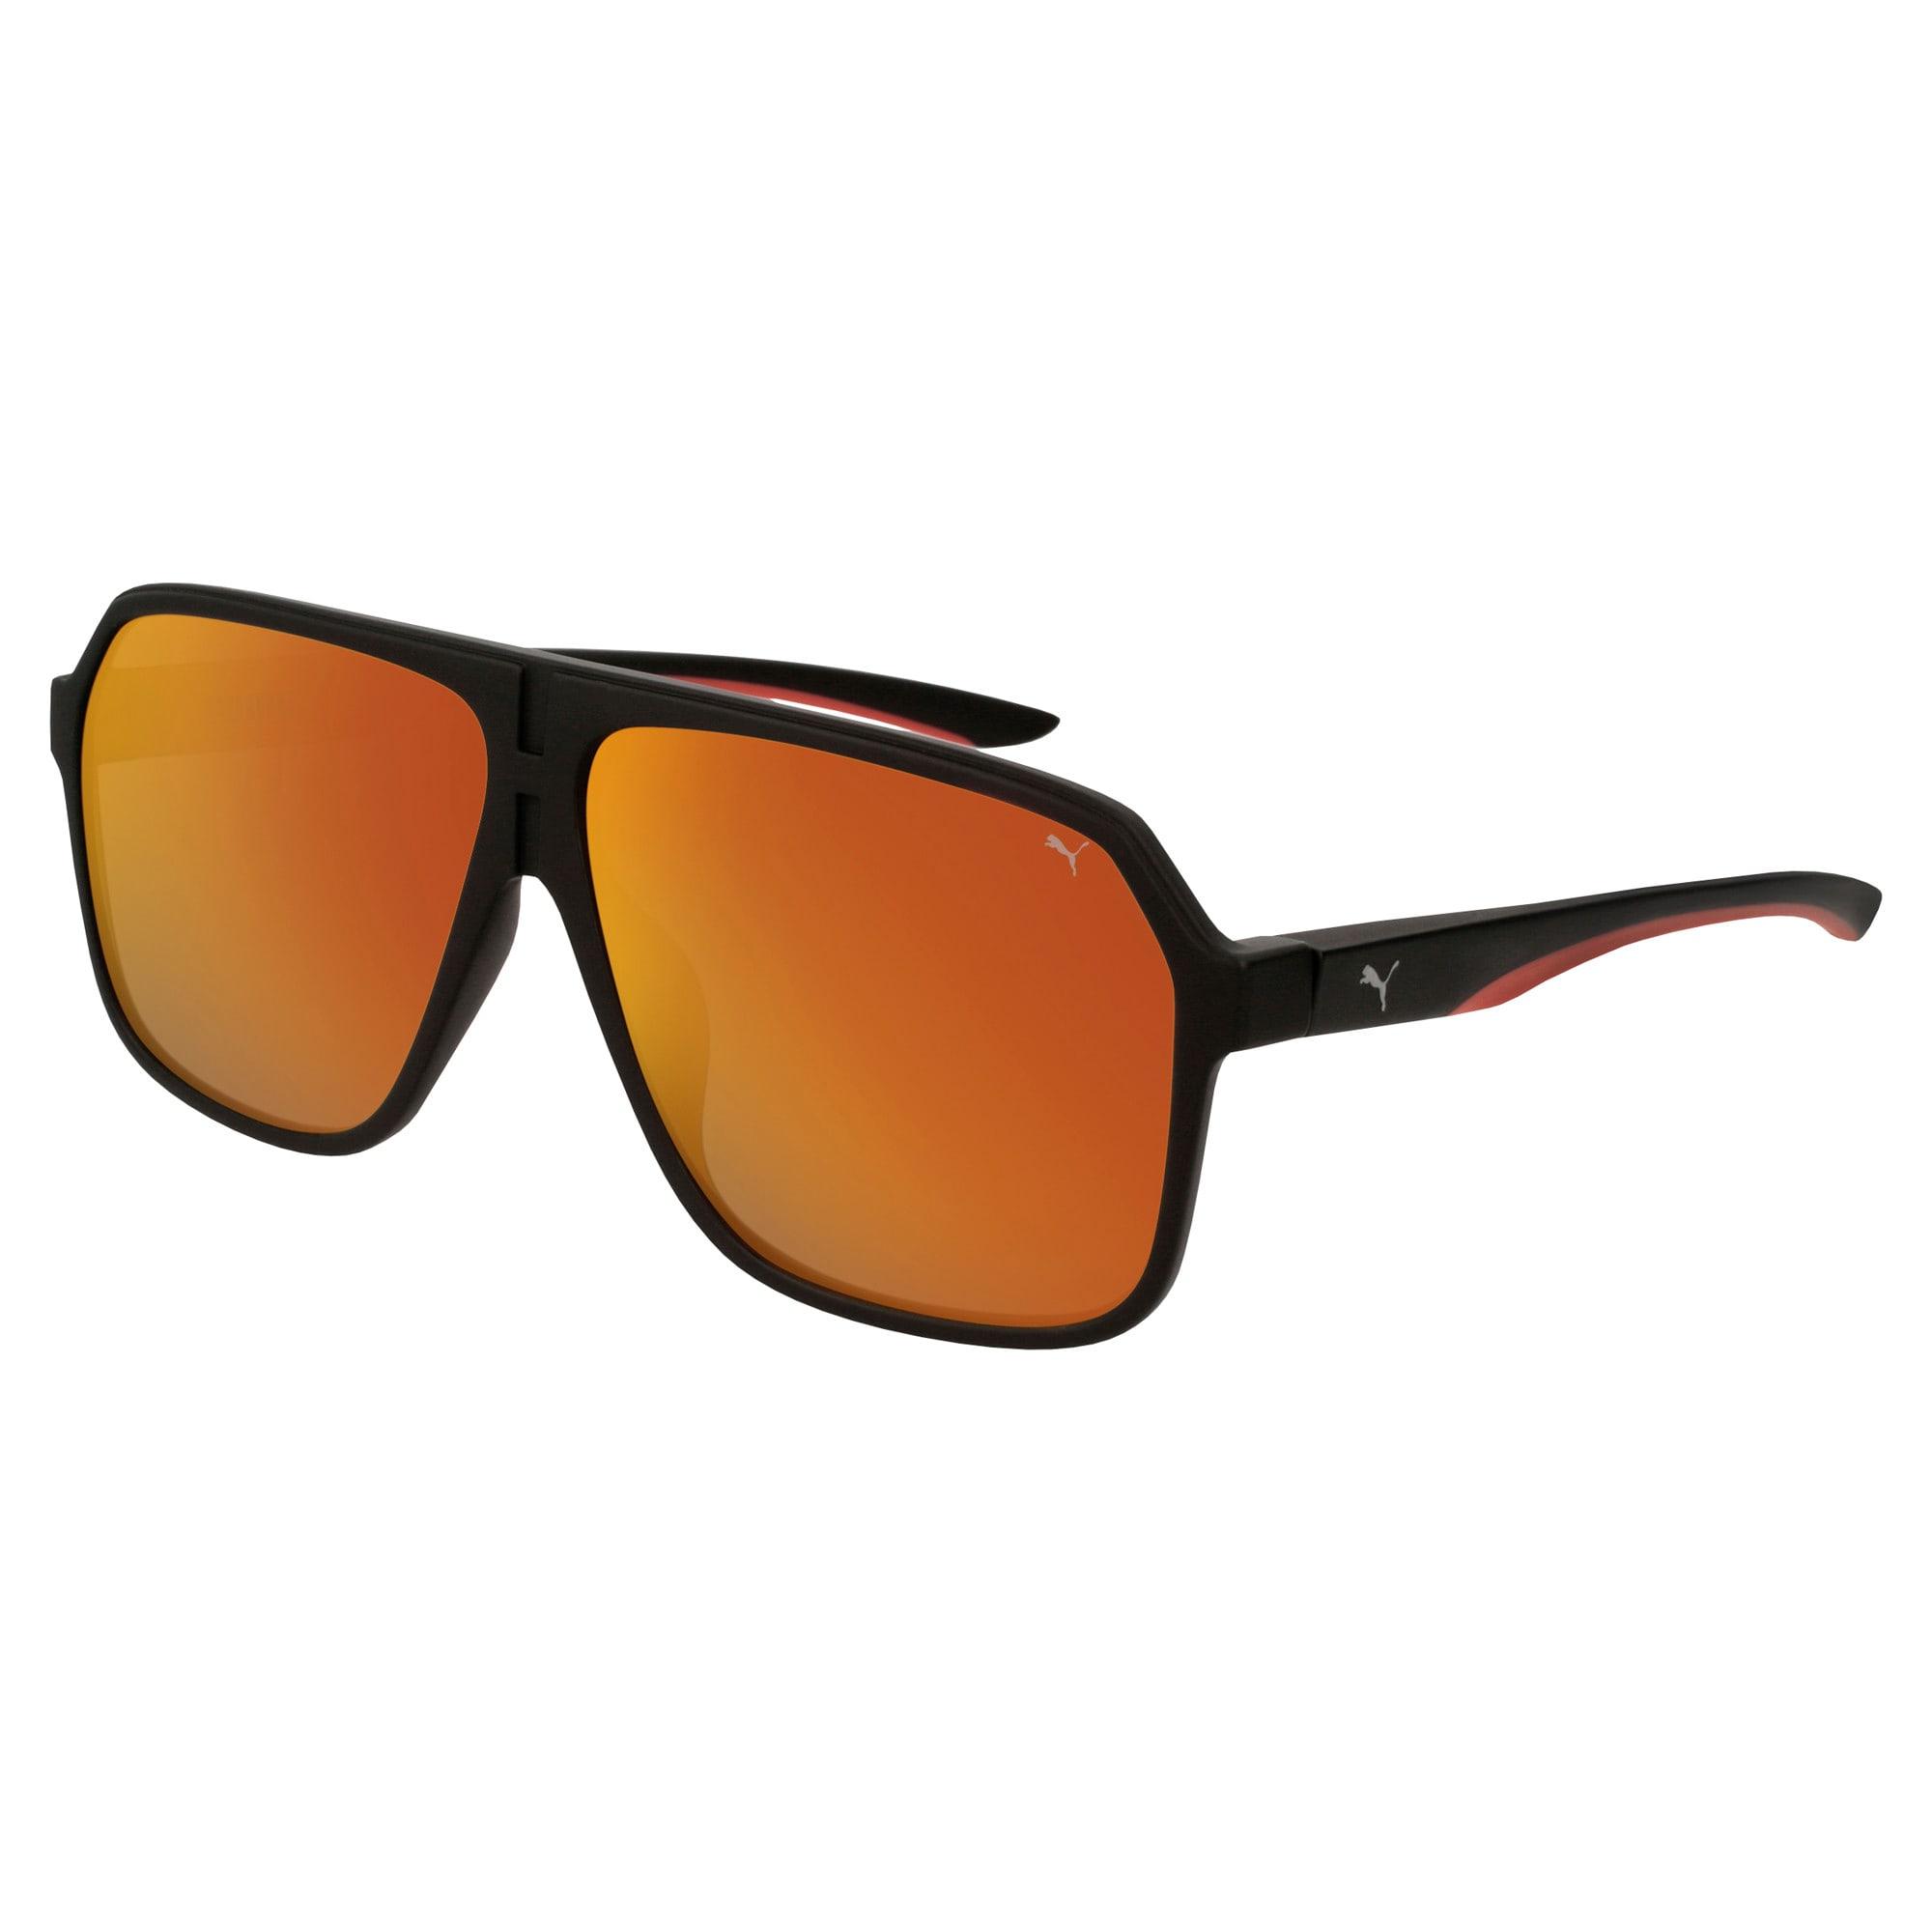 Thumbnail 1 of Men's Sunglasses, BLACK-BLACK-RED, medium